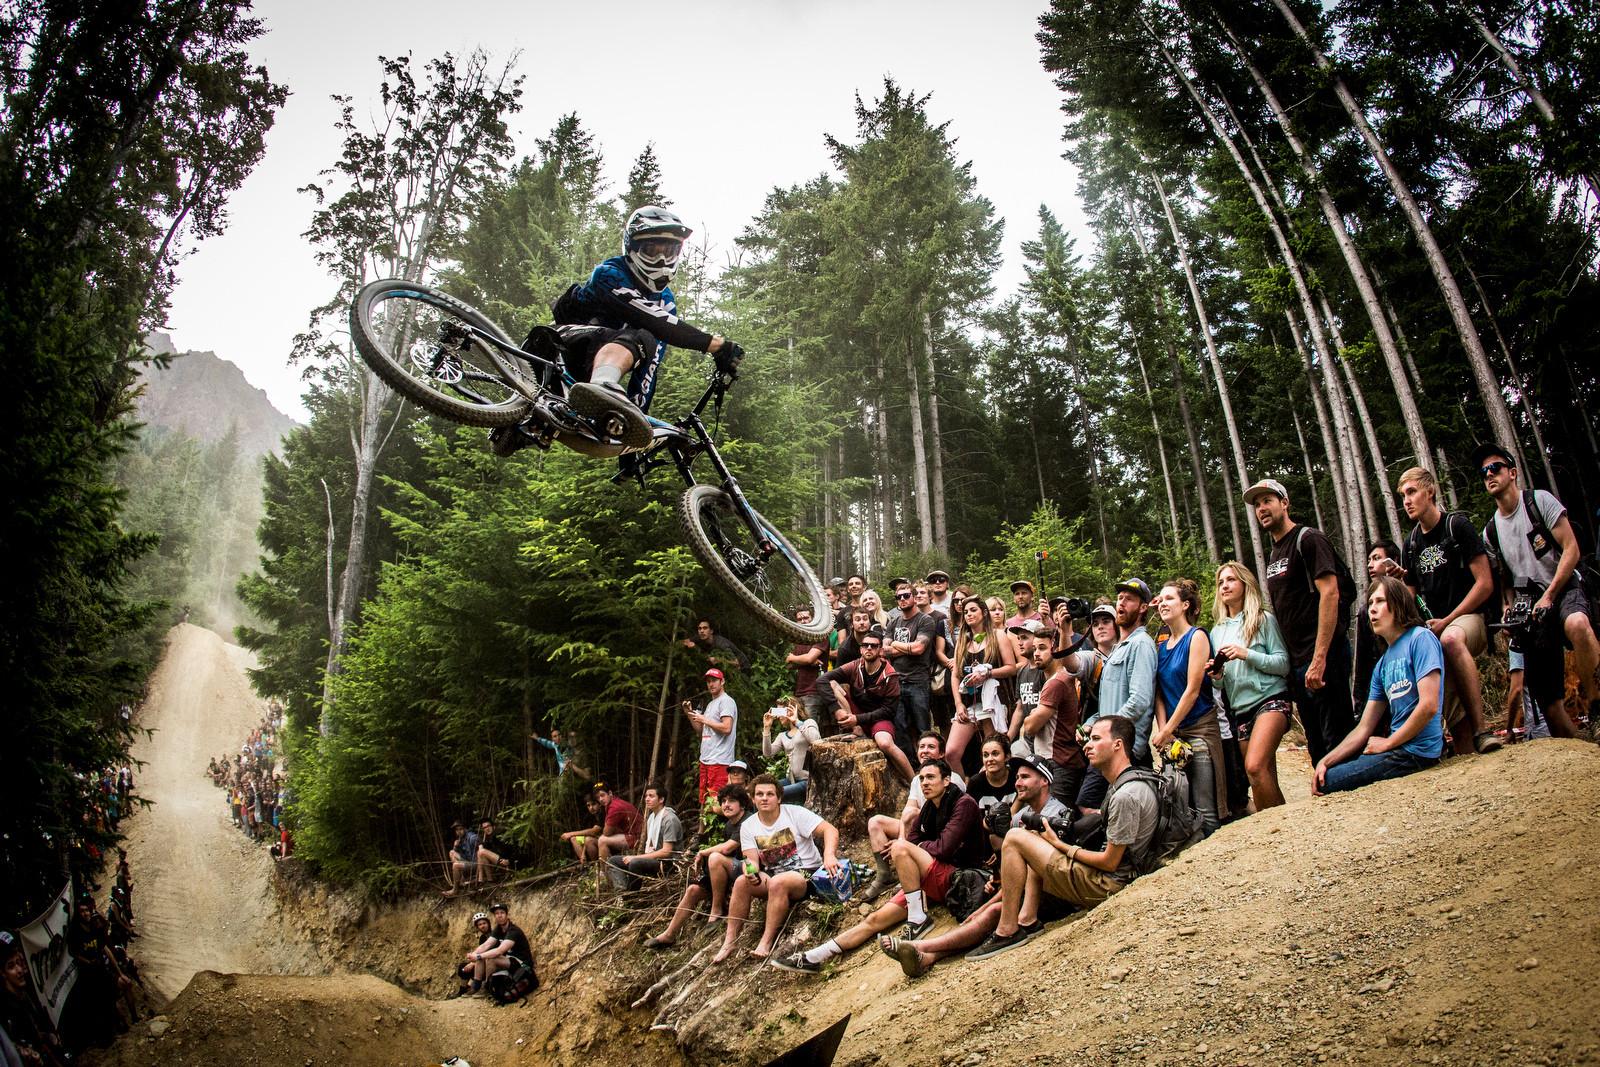 Reon Boe - Vertigo Bikes Whip Off at the Atlas Bar Wynyard Jam - Mountain Biking Pictures - Vital MTB